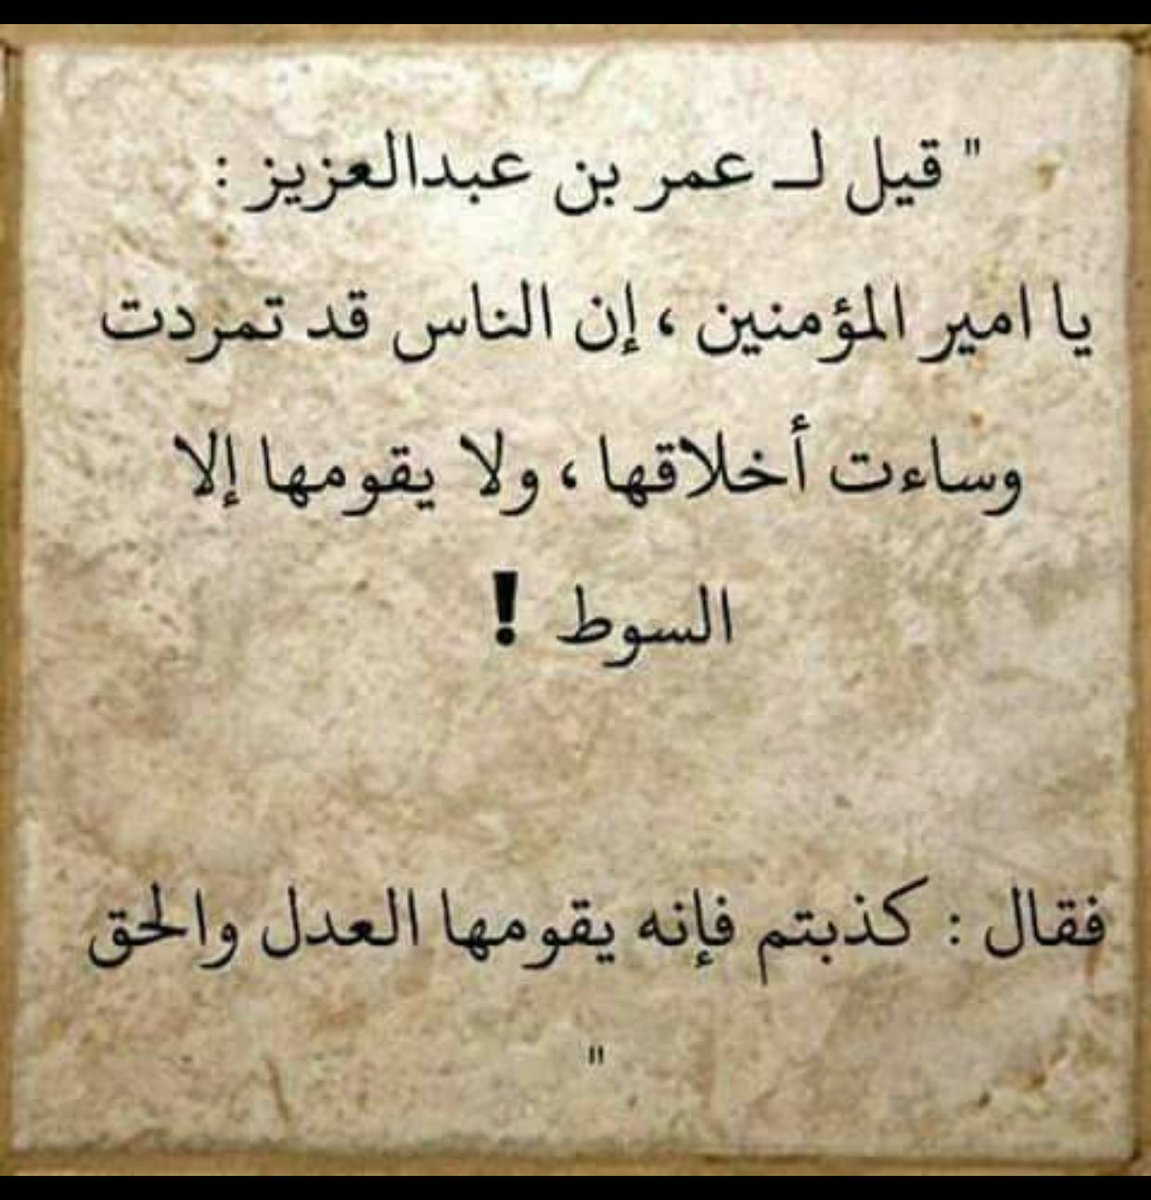 RT @304Walas9: #مقابله_محمد_بن_سلمان #محمد_بن_سلمان #بن_سلمان  -  Corruption fighter https://t.co/zThFS25eHV